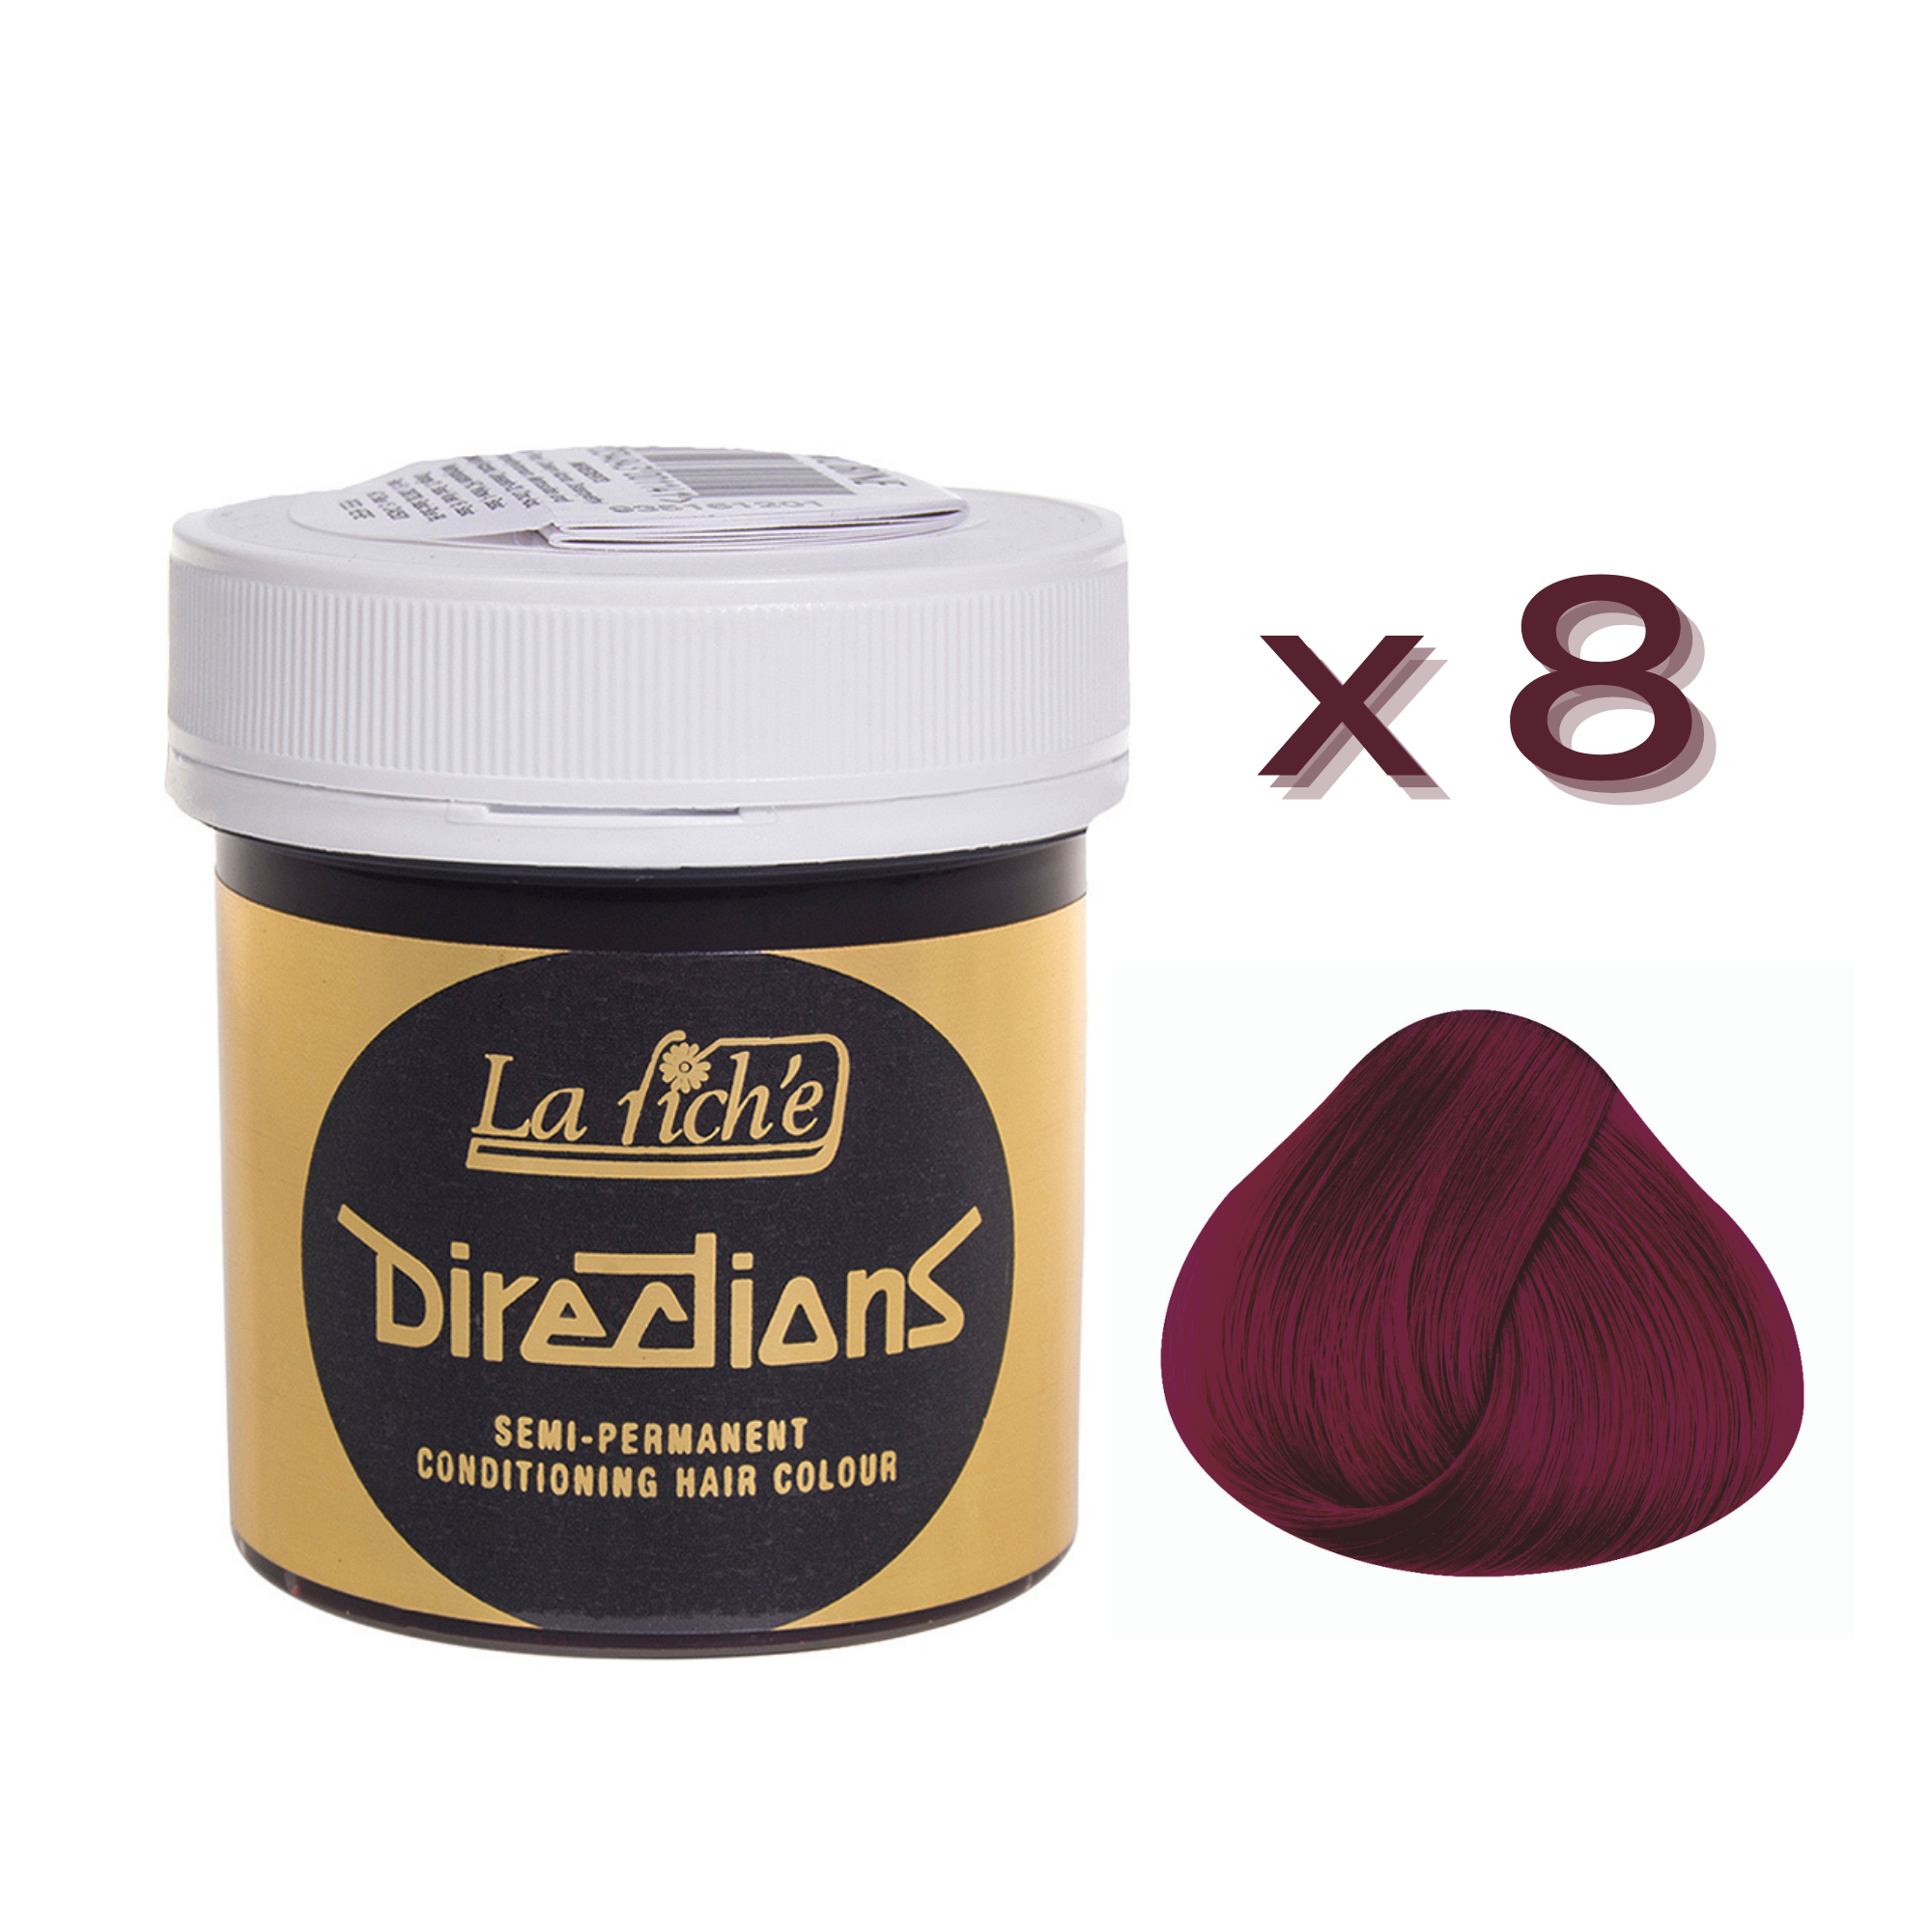 8 x La Riche Directions Semi-Permanent Hair Color 88ml Tubs - RUBINE